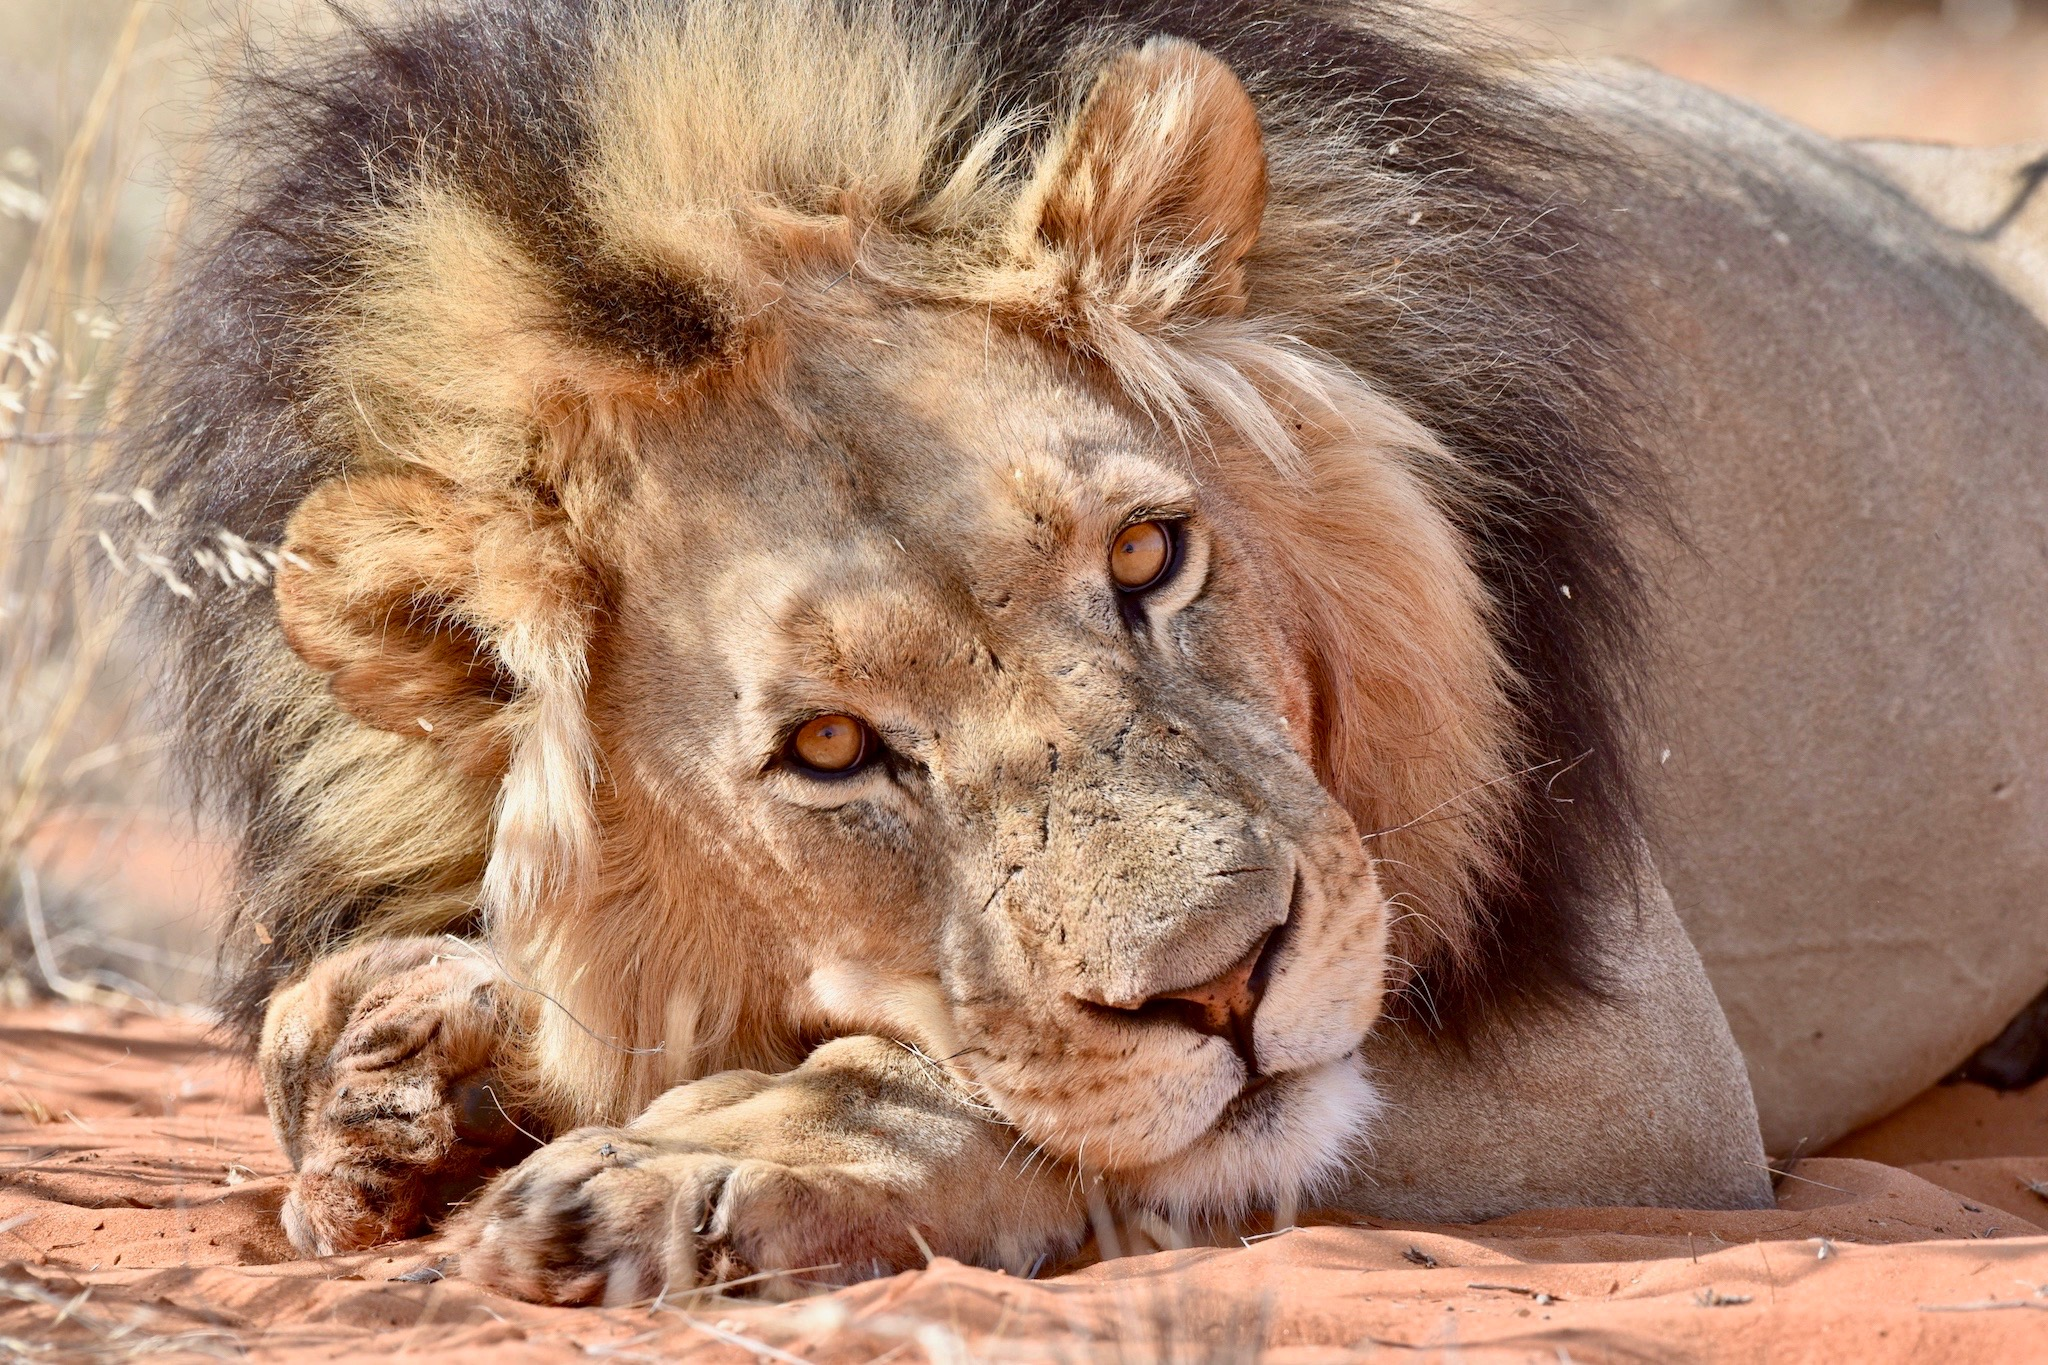 Löwenmännchen mit prächtiger Mähne